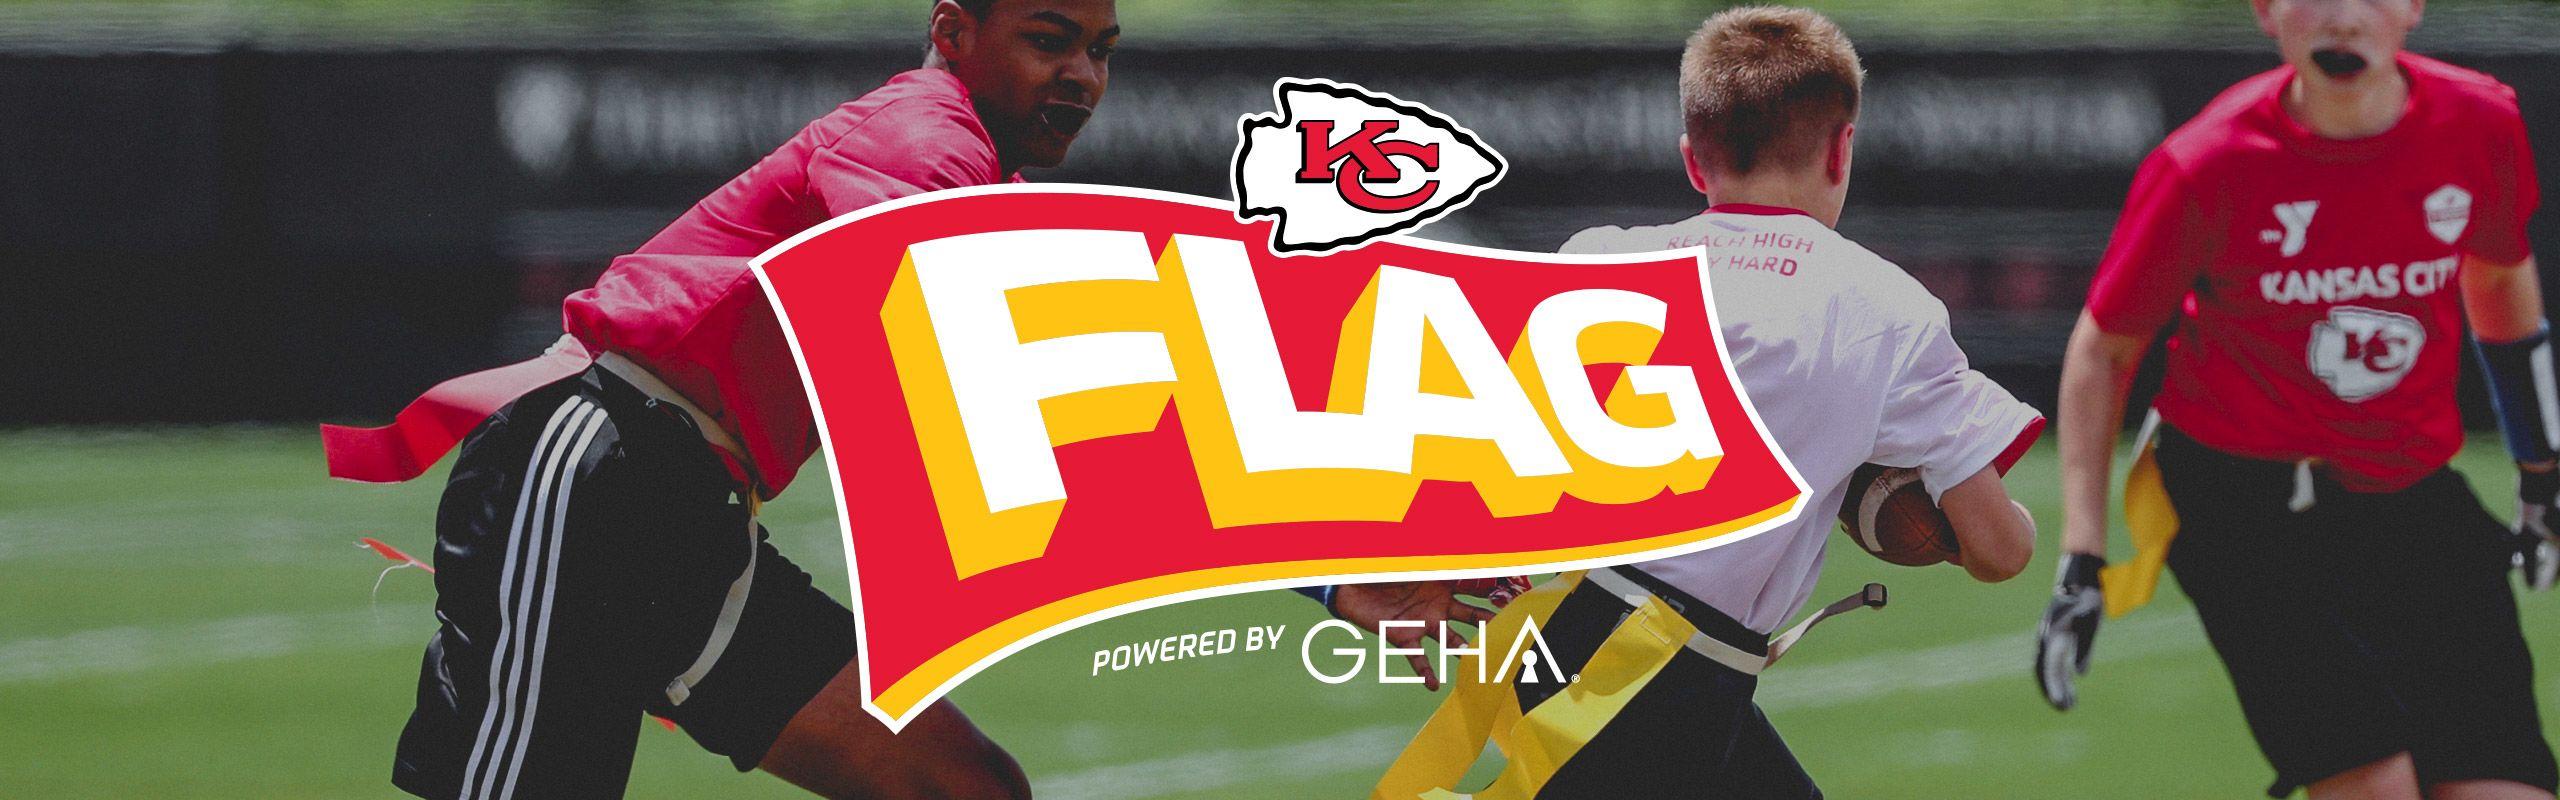 Chiefs-Flag-Header